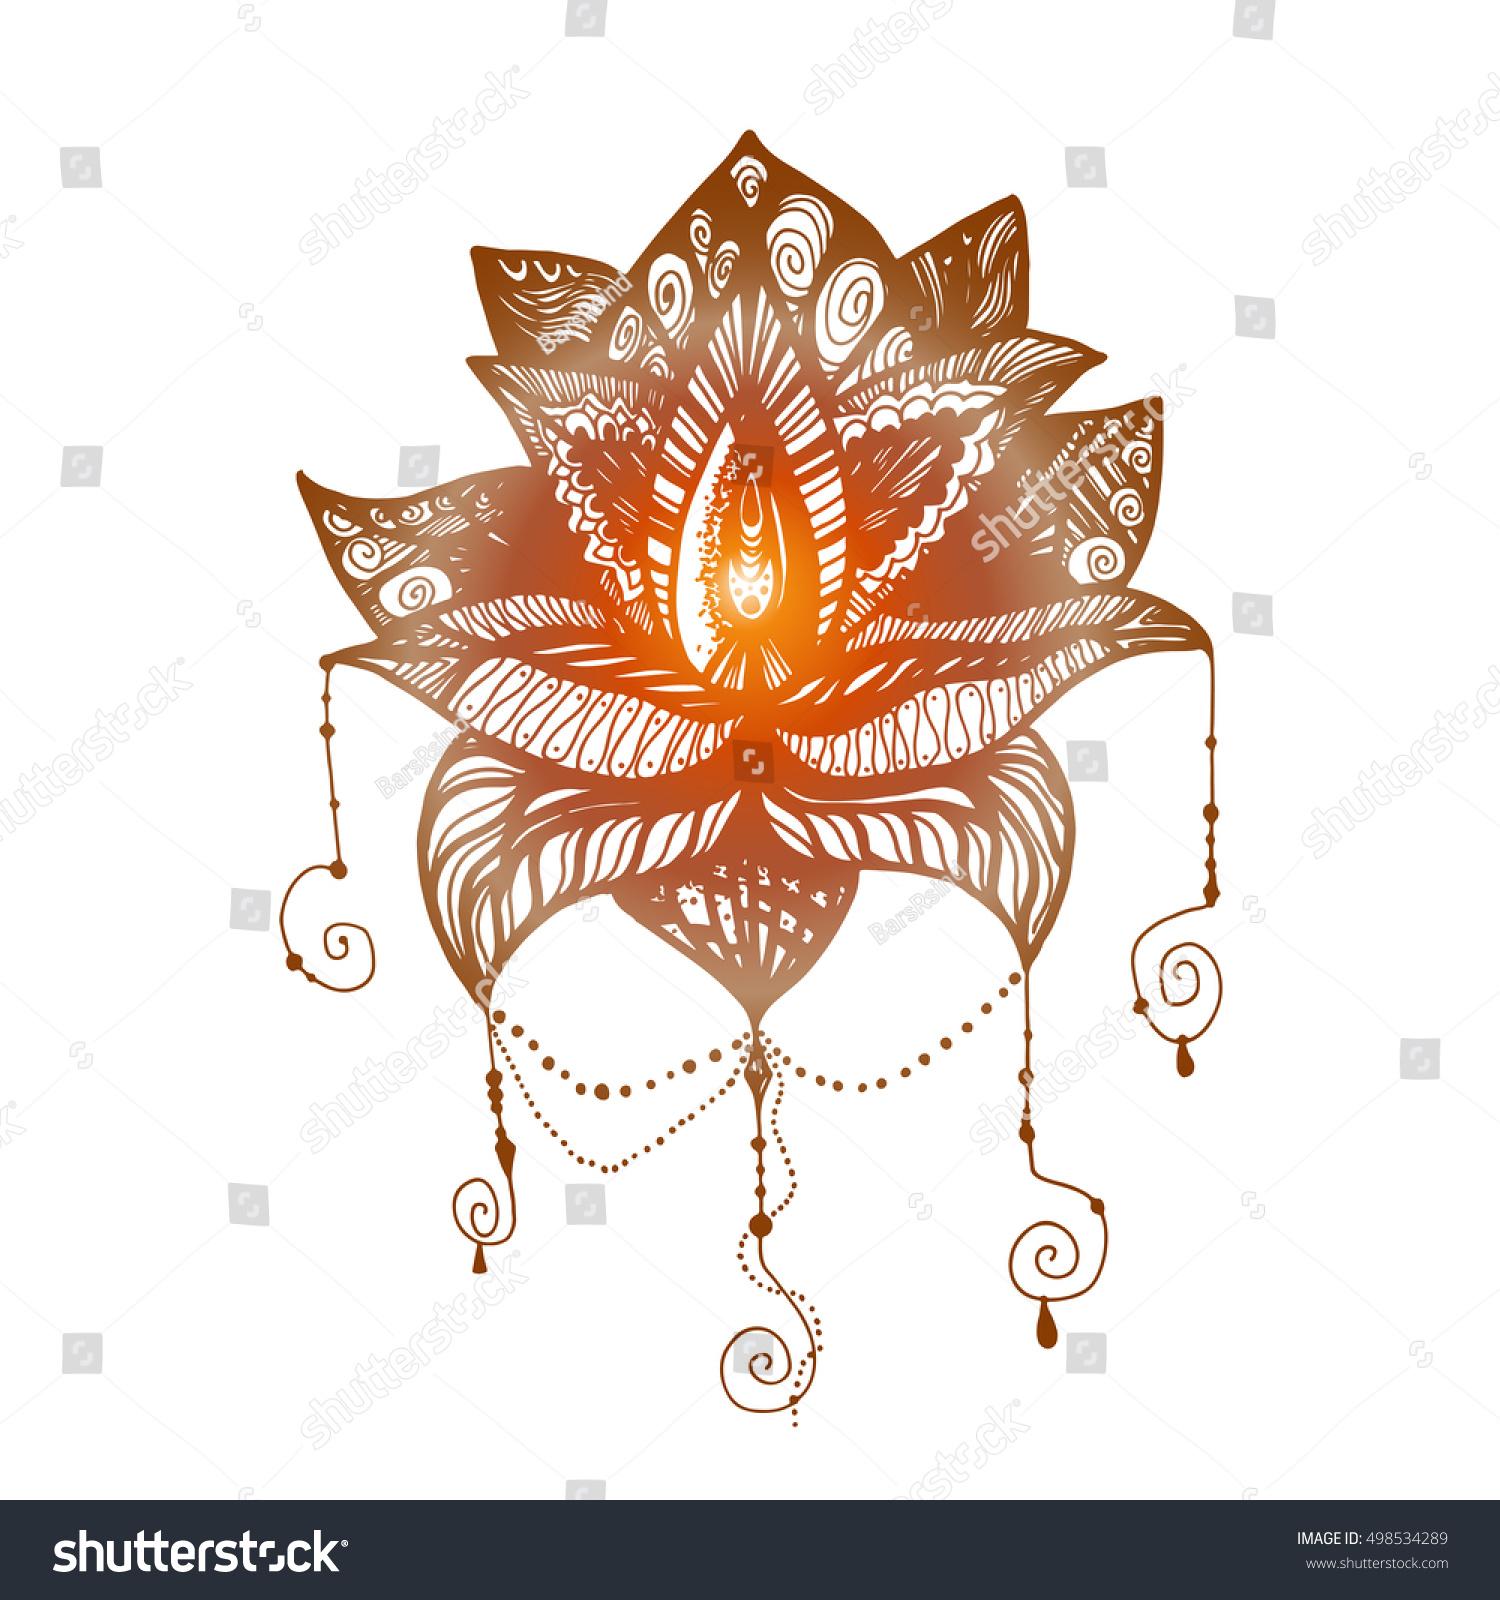 Flower lotus magic symbol print tattoo stock vector 498534289 flower lotus magic symbol for print tattoo coloring bookfabric t izmirmasajfo